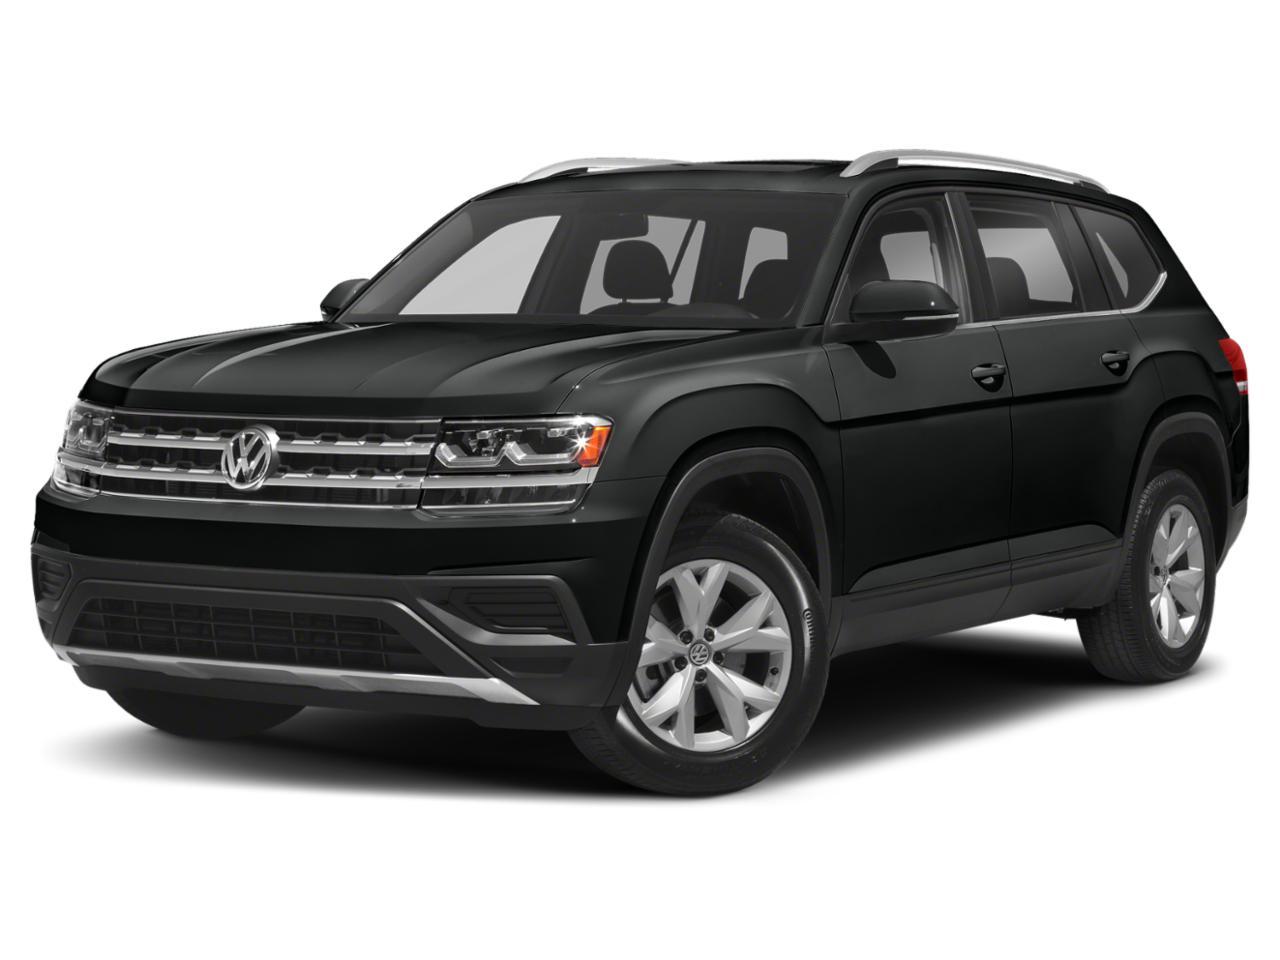 2020 Volkswagen Atlas Vehicle Photo in San Antonio, TX 78257